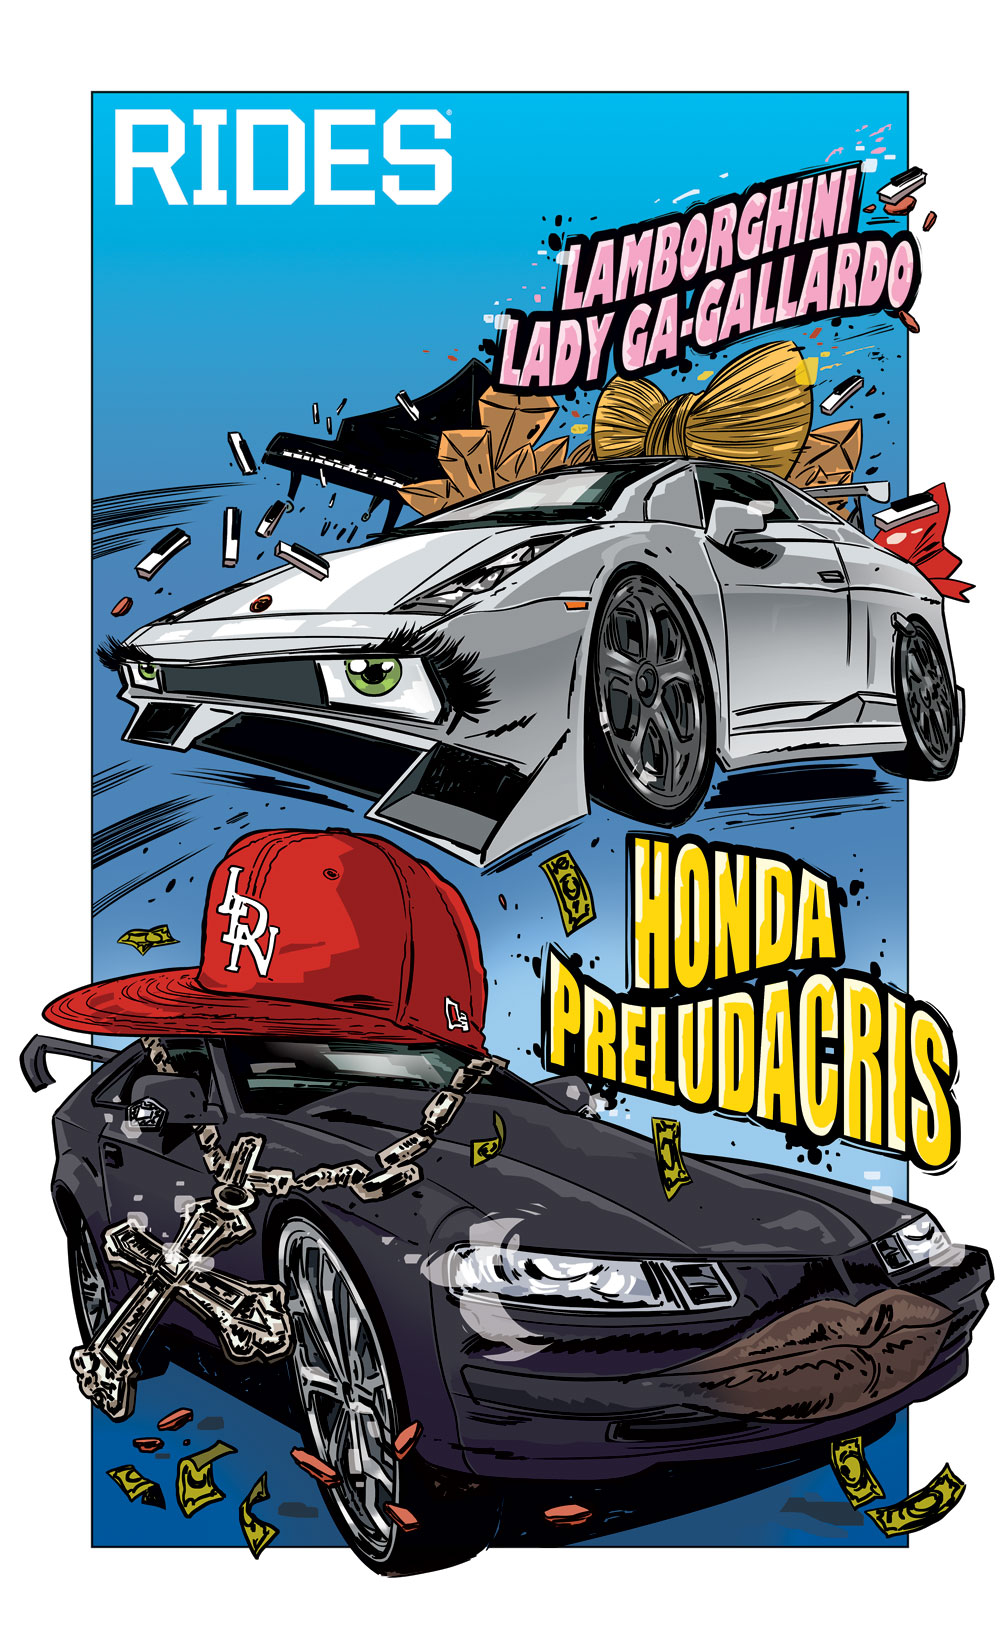 rides cars honda preludacris lamborghini lady ga-gallardo tin salamunic